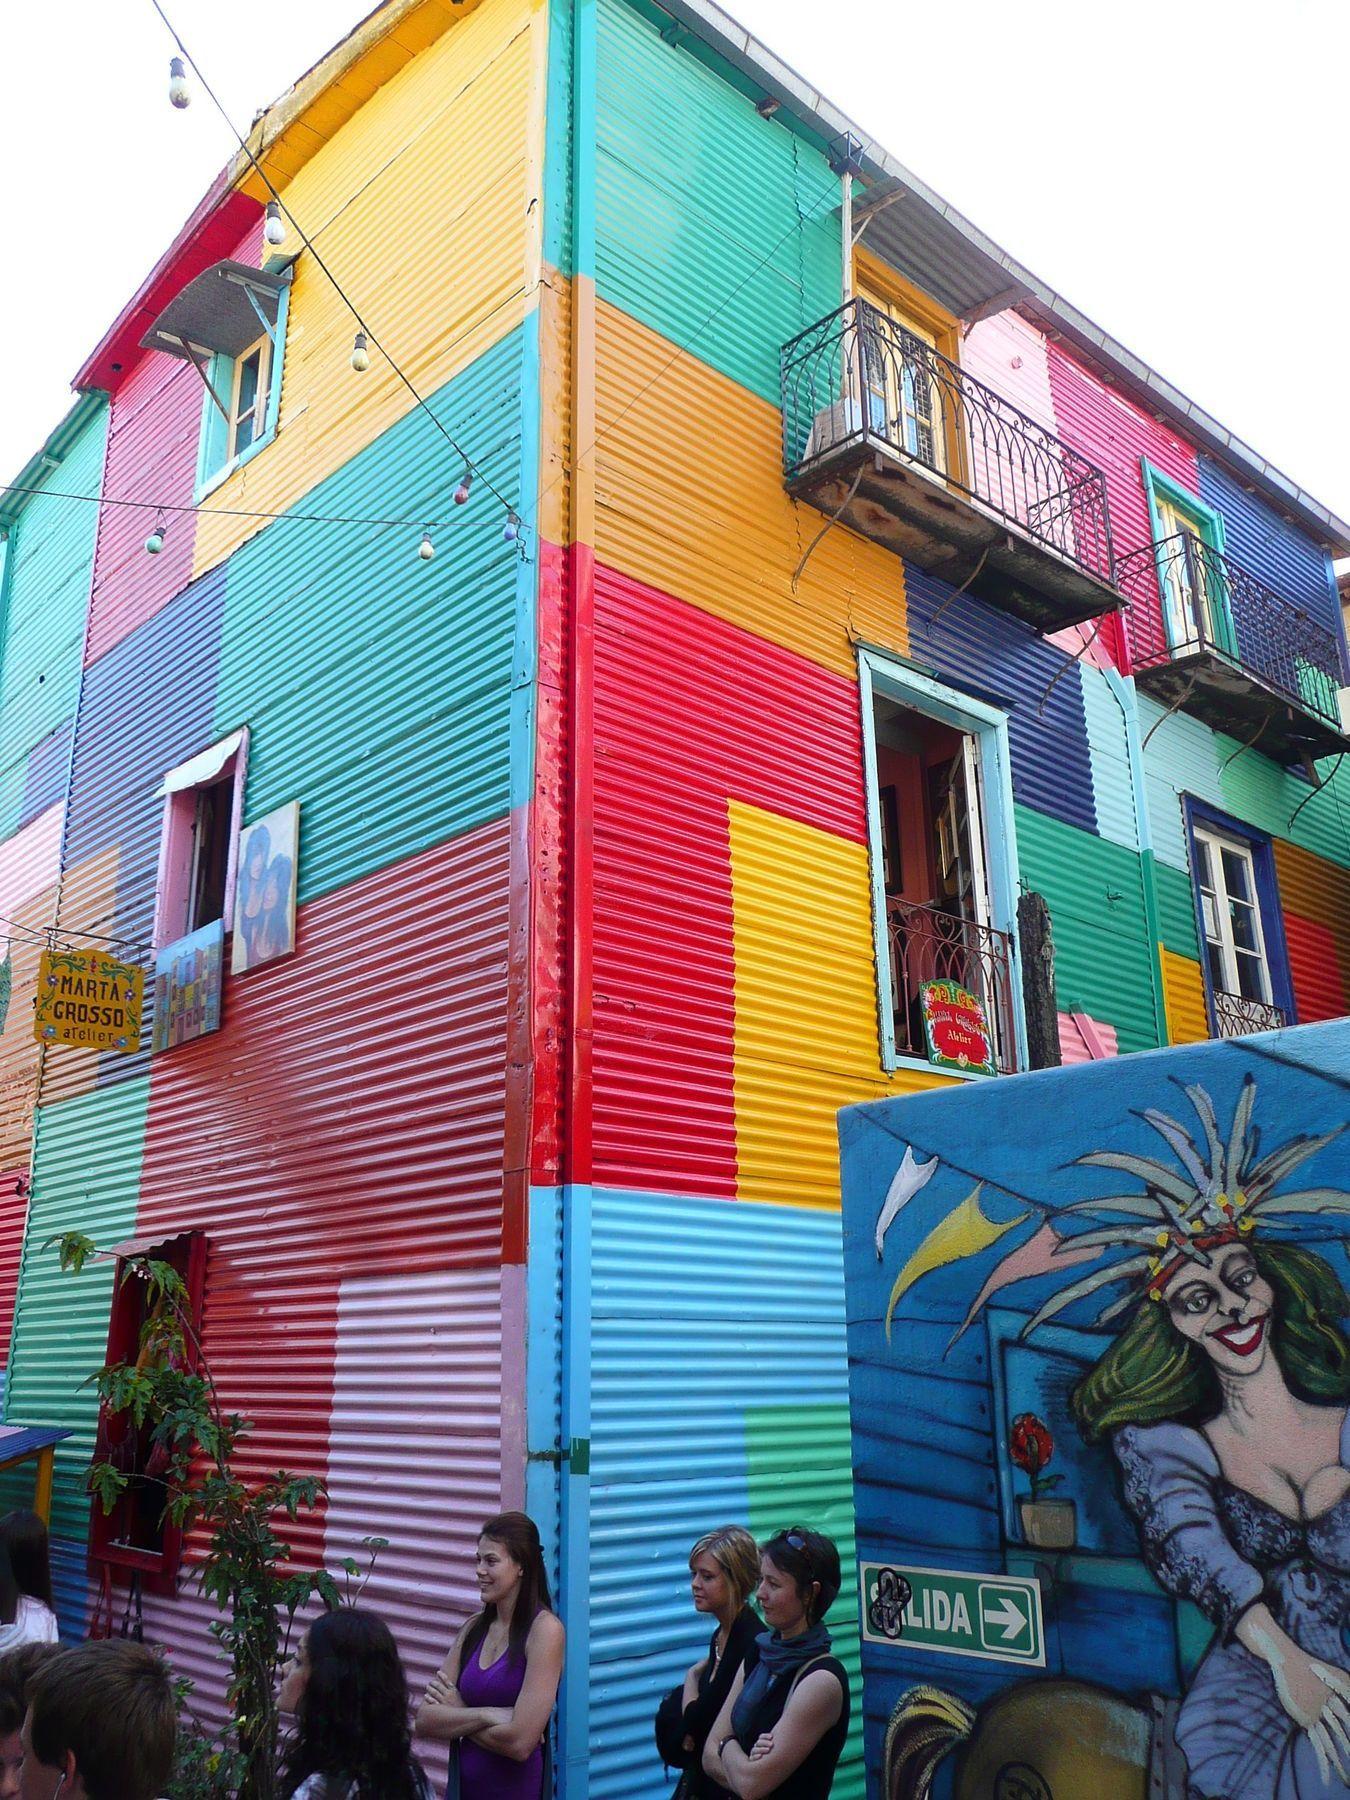 Colorful Building In La Boca Argentina Argentina Pinterest  # Muebles Lola Mora Bahia Blanca